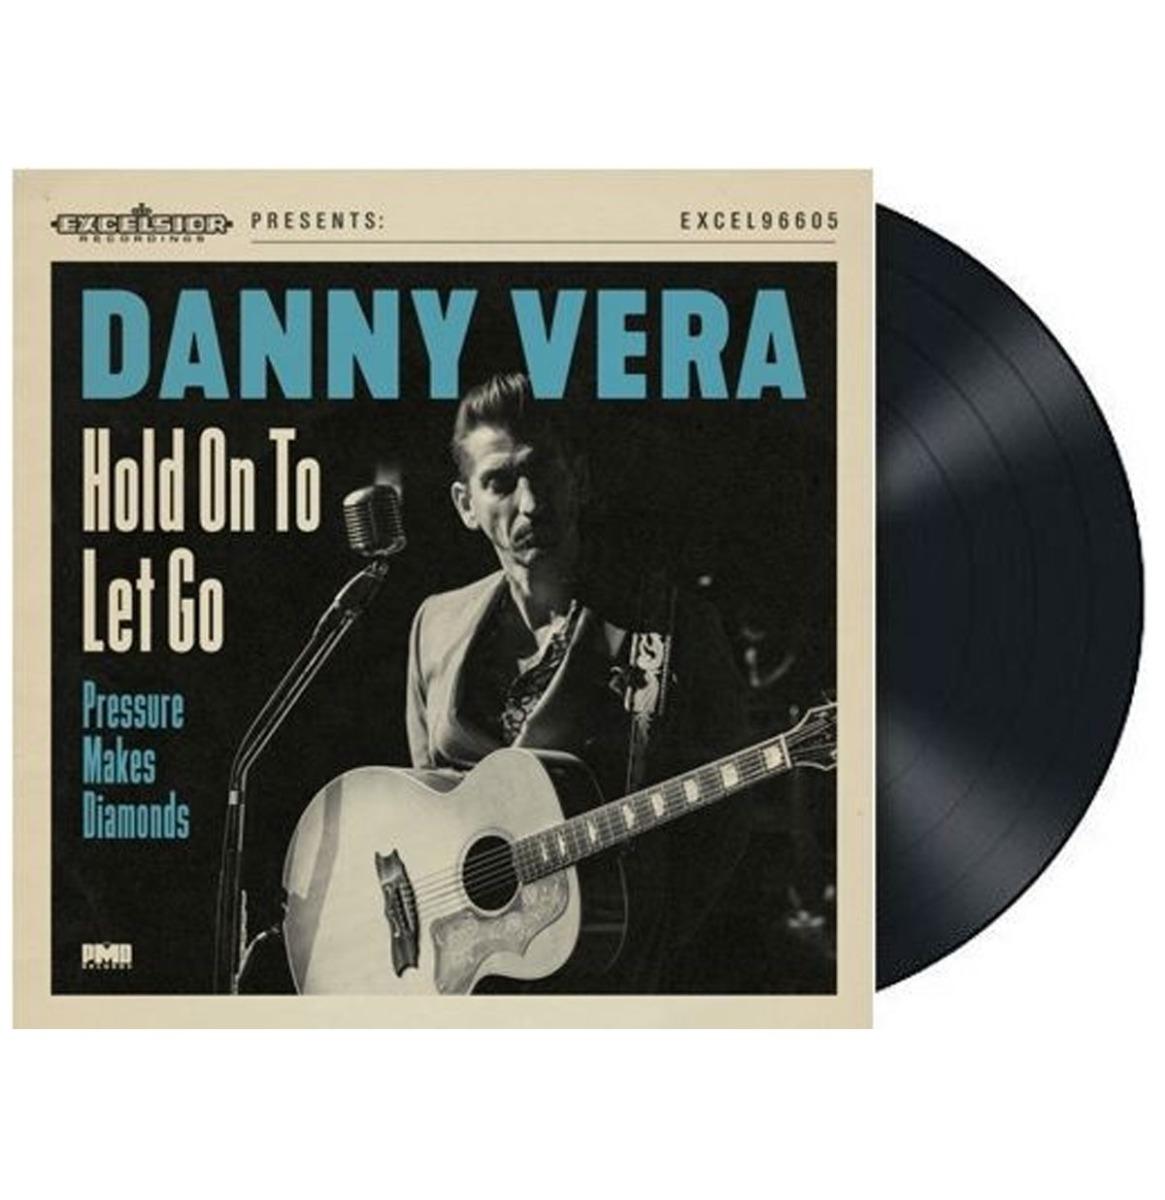 Single: Danny Vera - Hold On To Let Go / Pressure Makes Diamonds 2020 Version